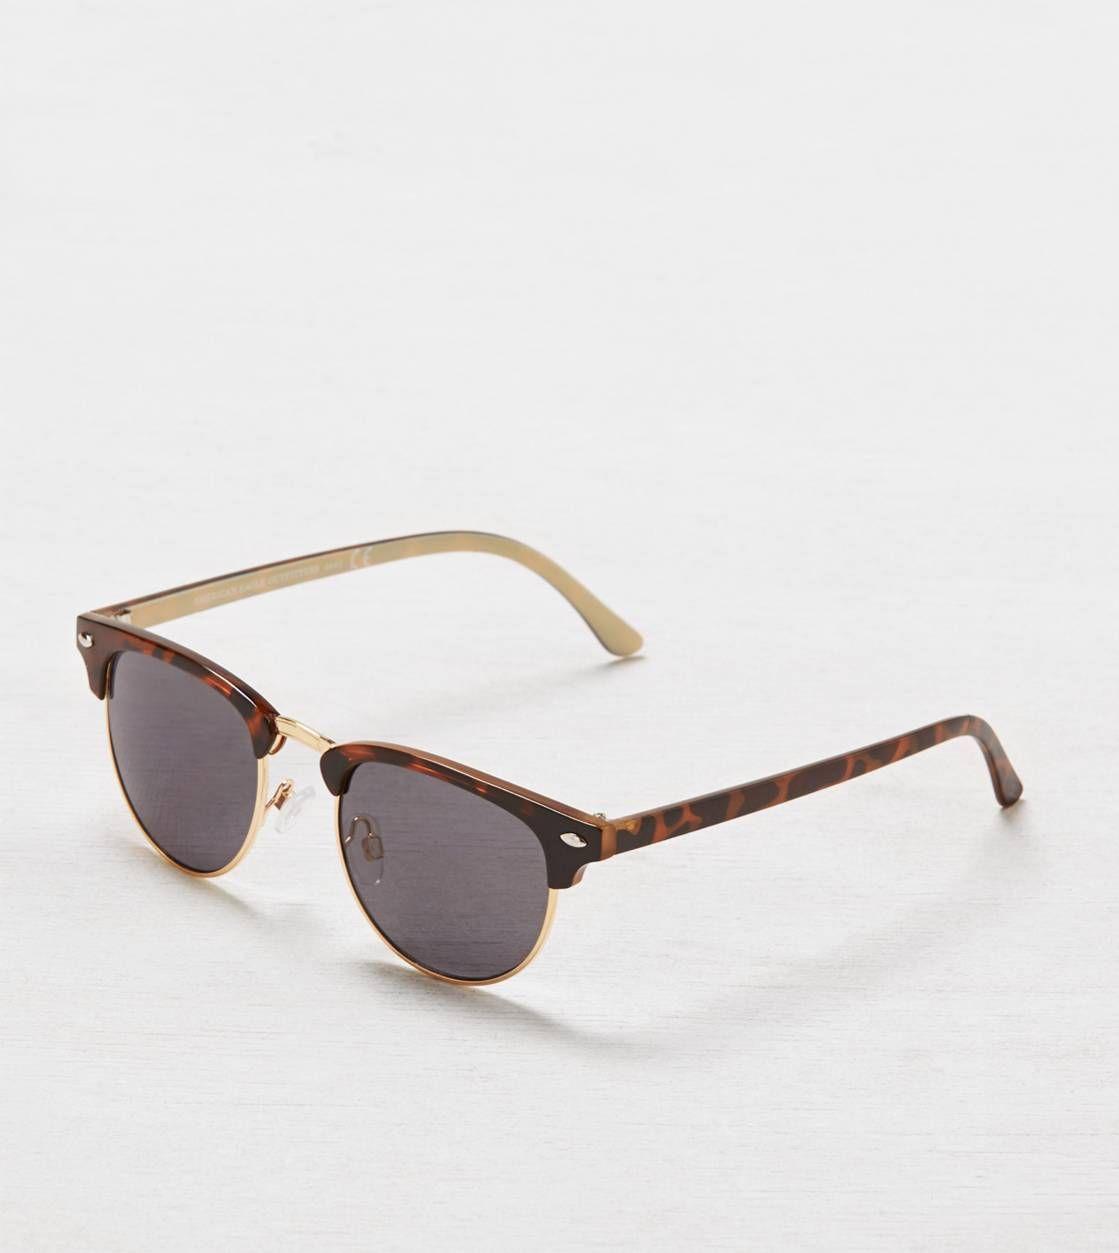 AEO Tortoise Shell Half-Rim Sunglasses